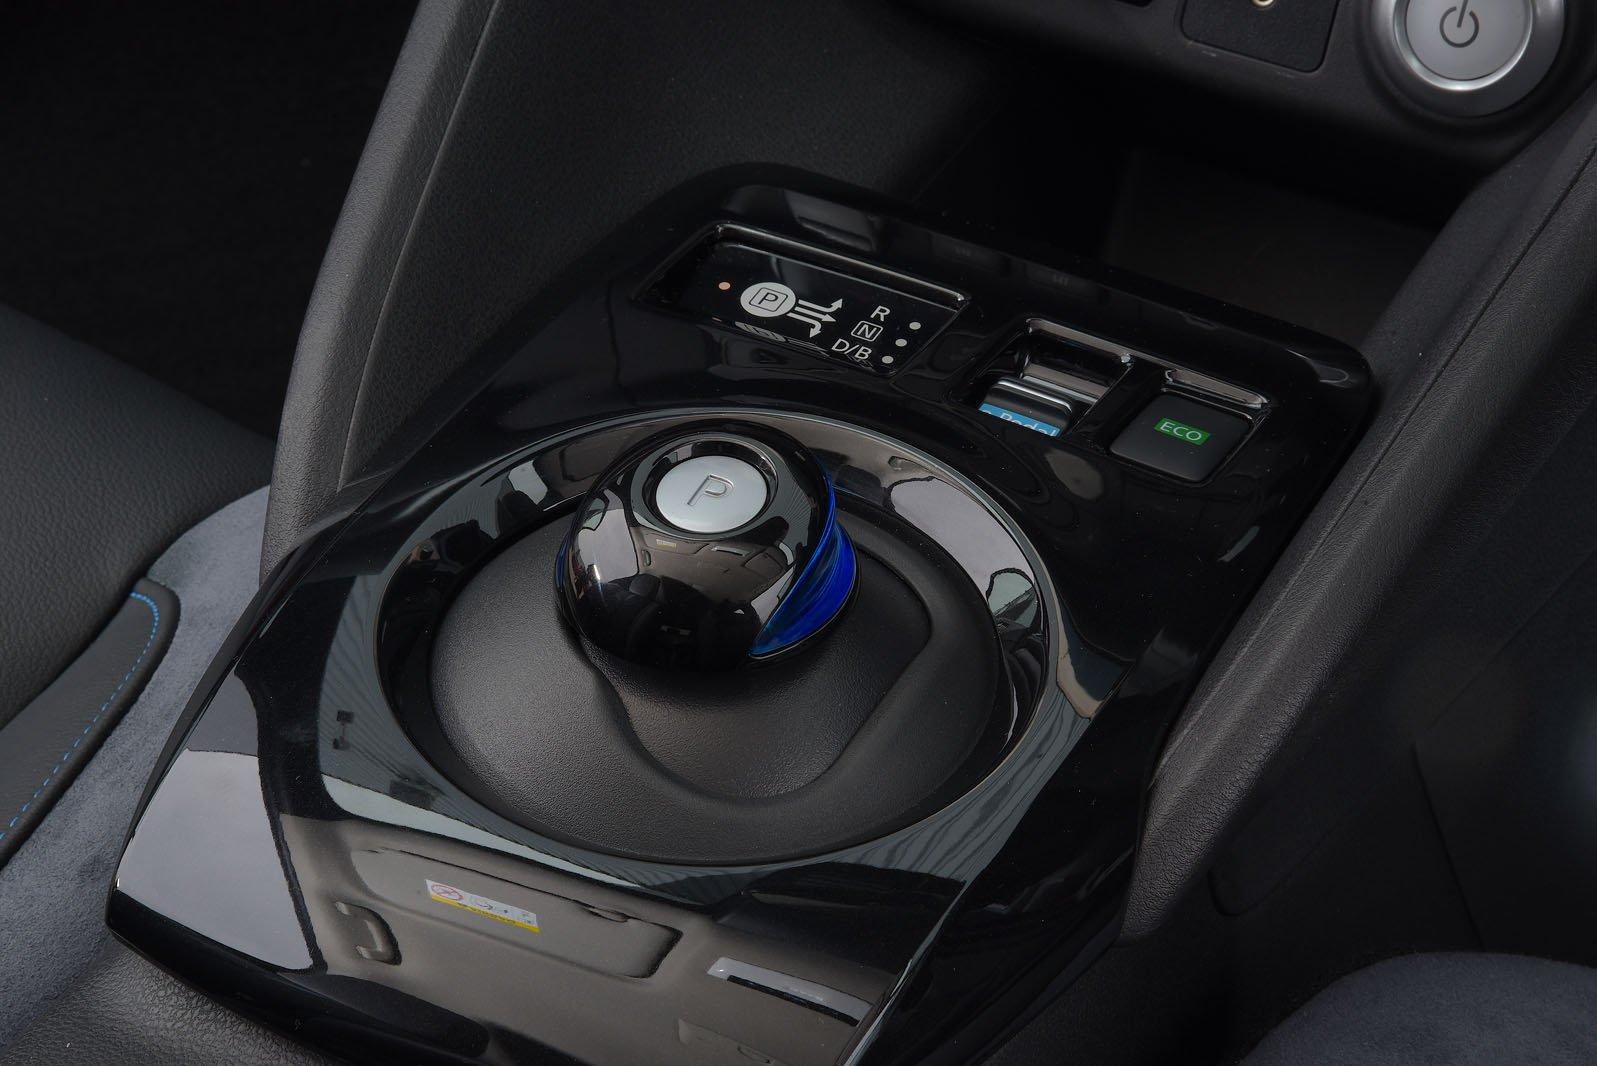 2019 Nissan Leaf 62kWh gear selector